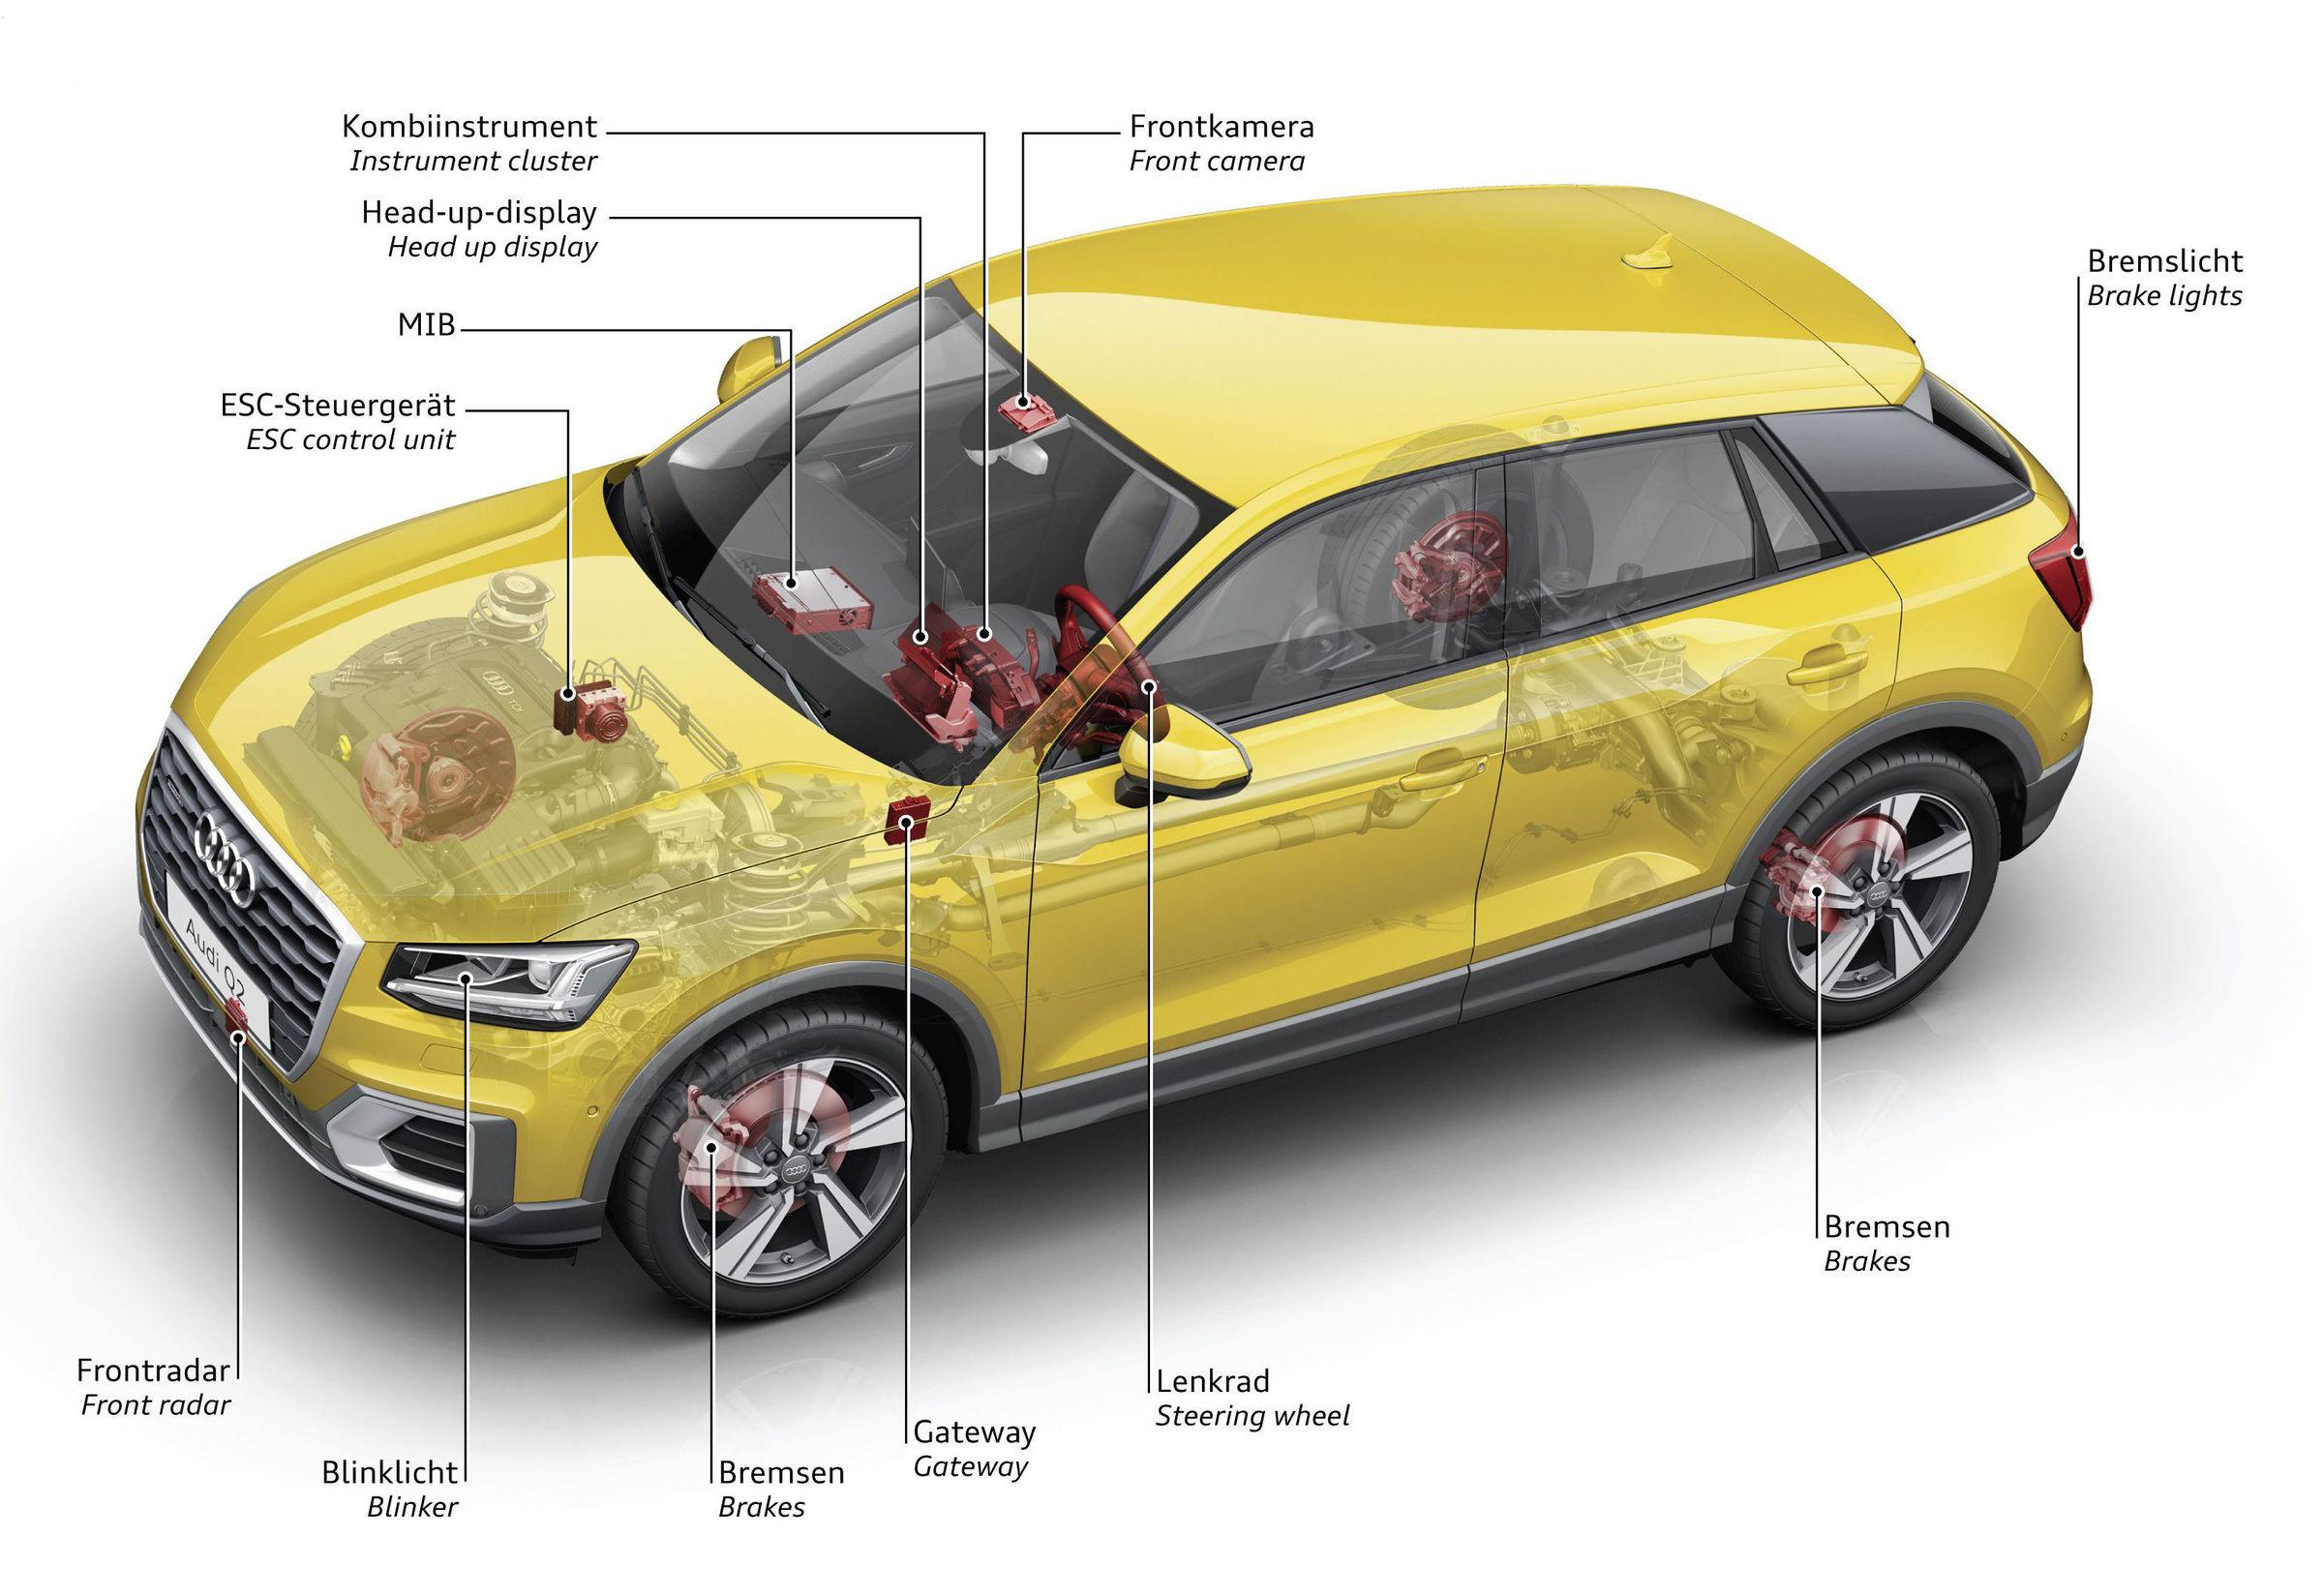 Rear View Monitors/cams & Kits Car Rear View Camera For Audi A3 A4 A6l S5 Q7 Auto Trunk Handle Backup Camera Rapid Heat Dissipation